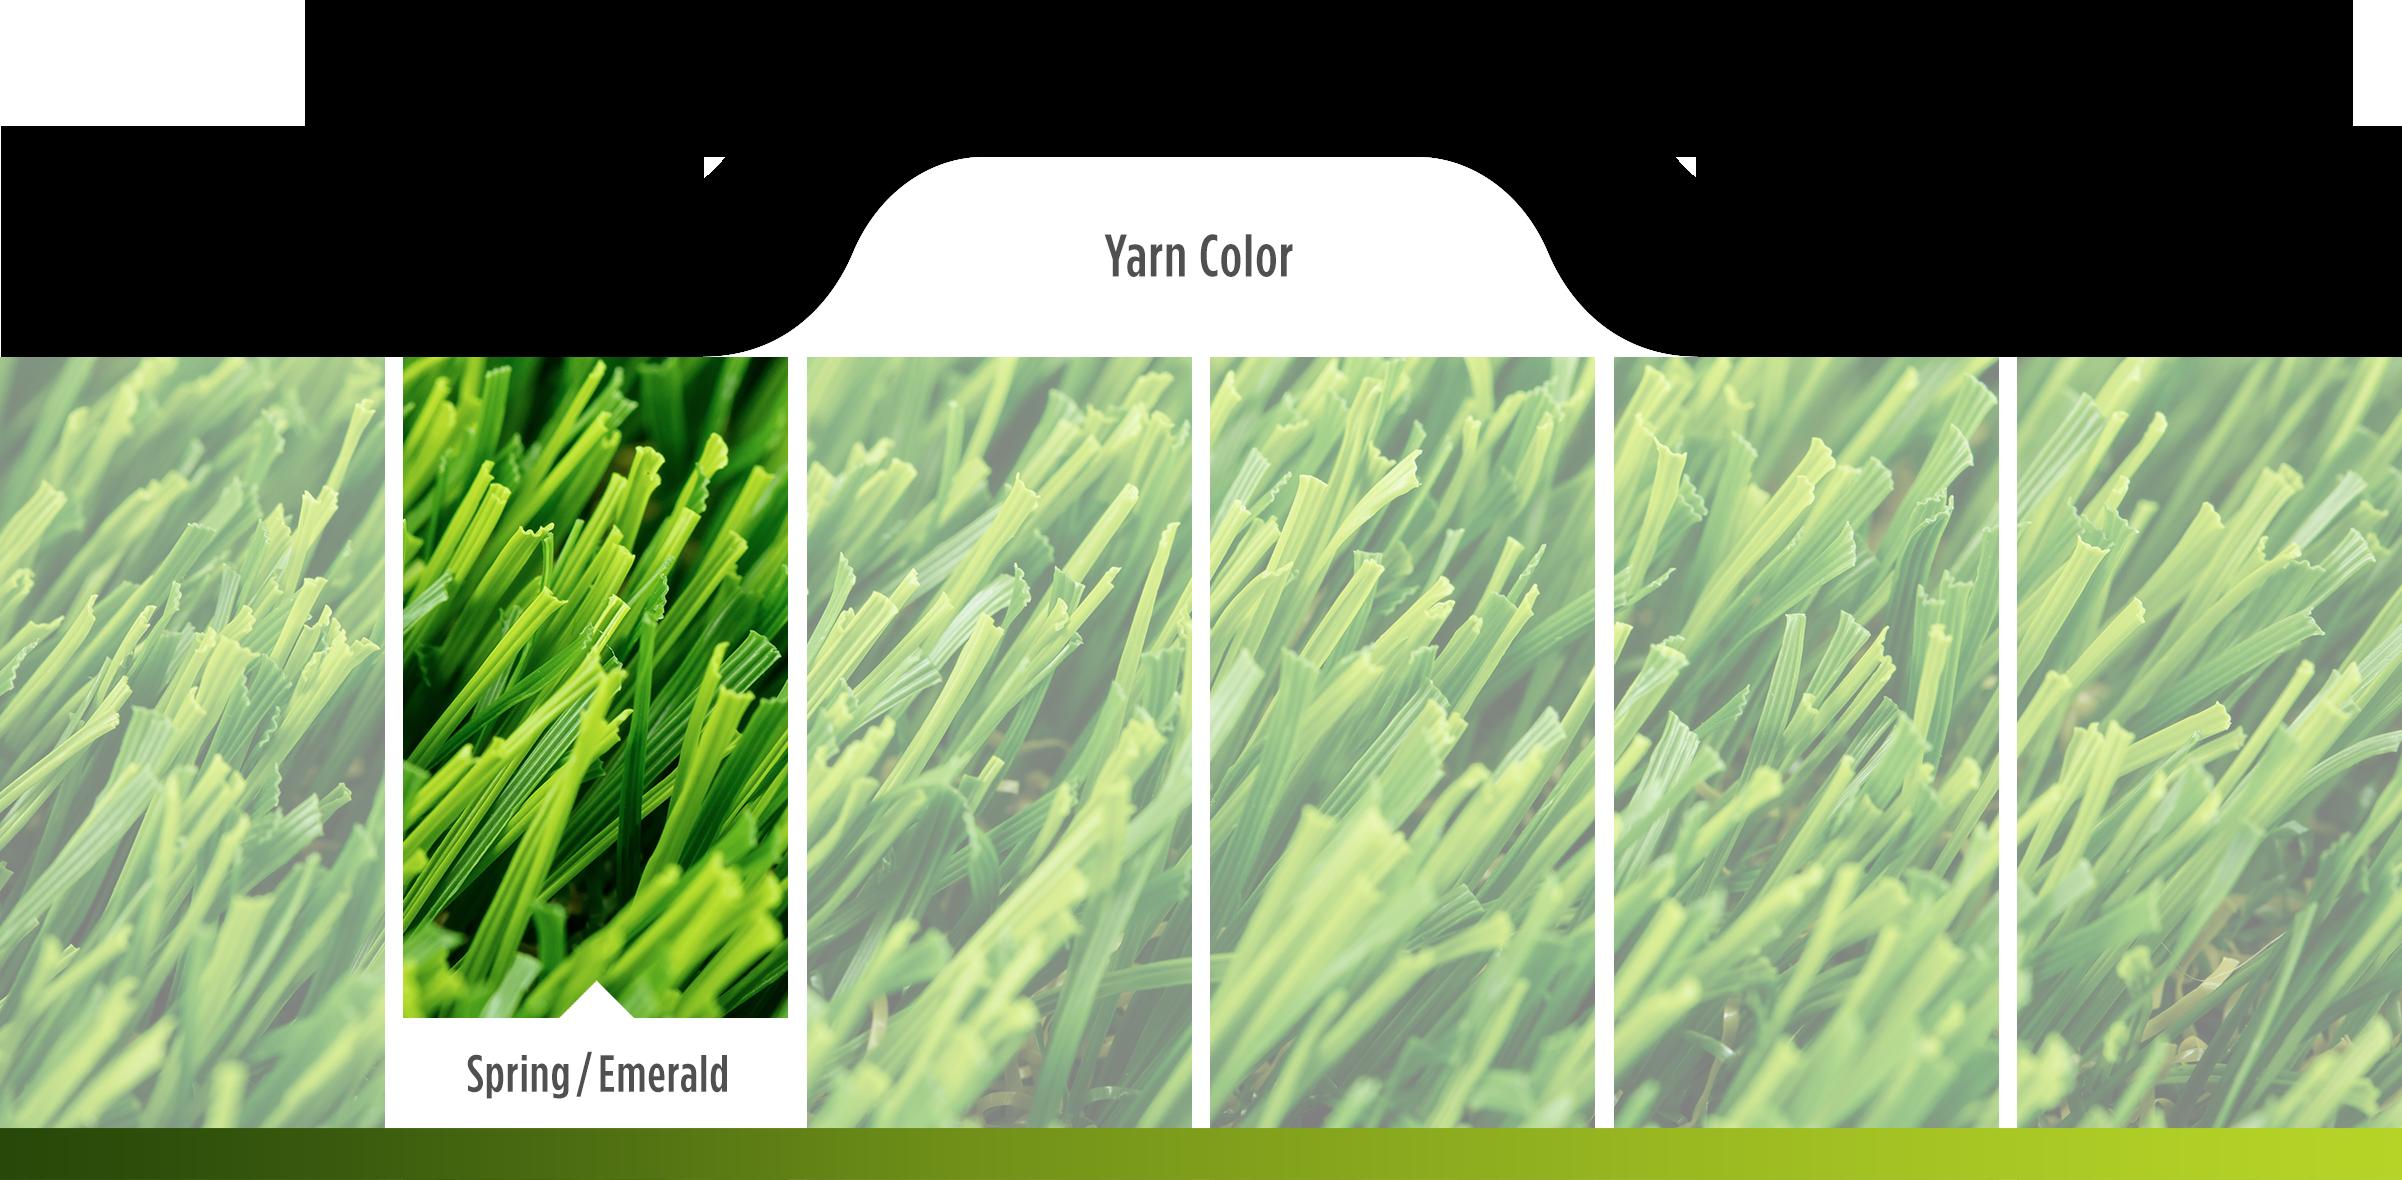 spring emerald yarn color